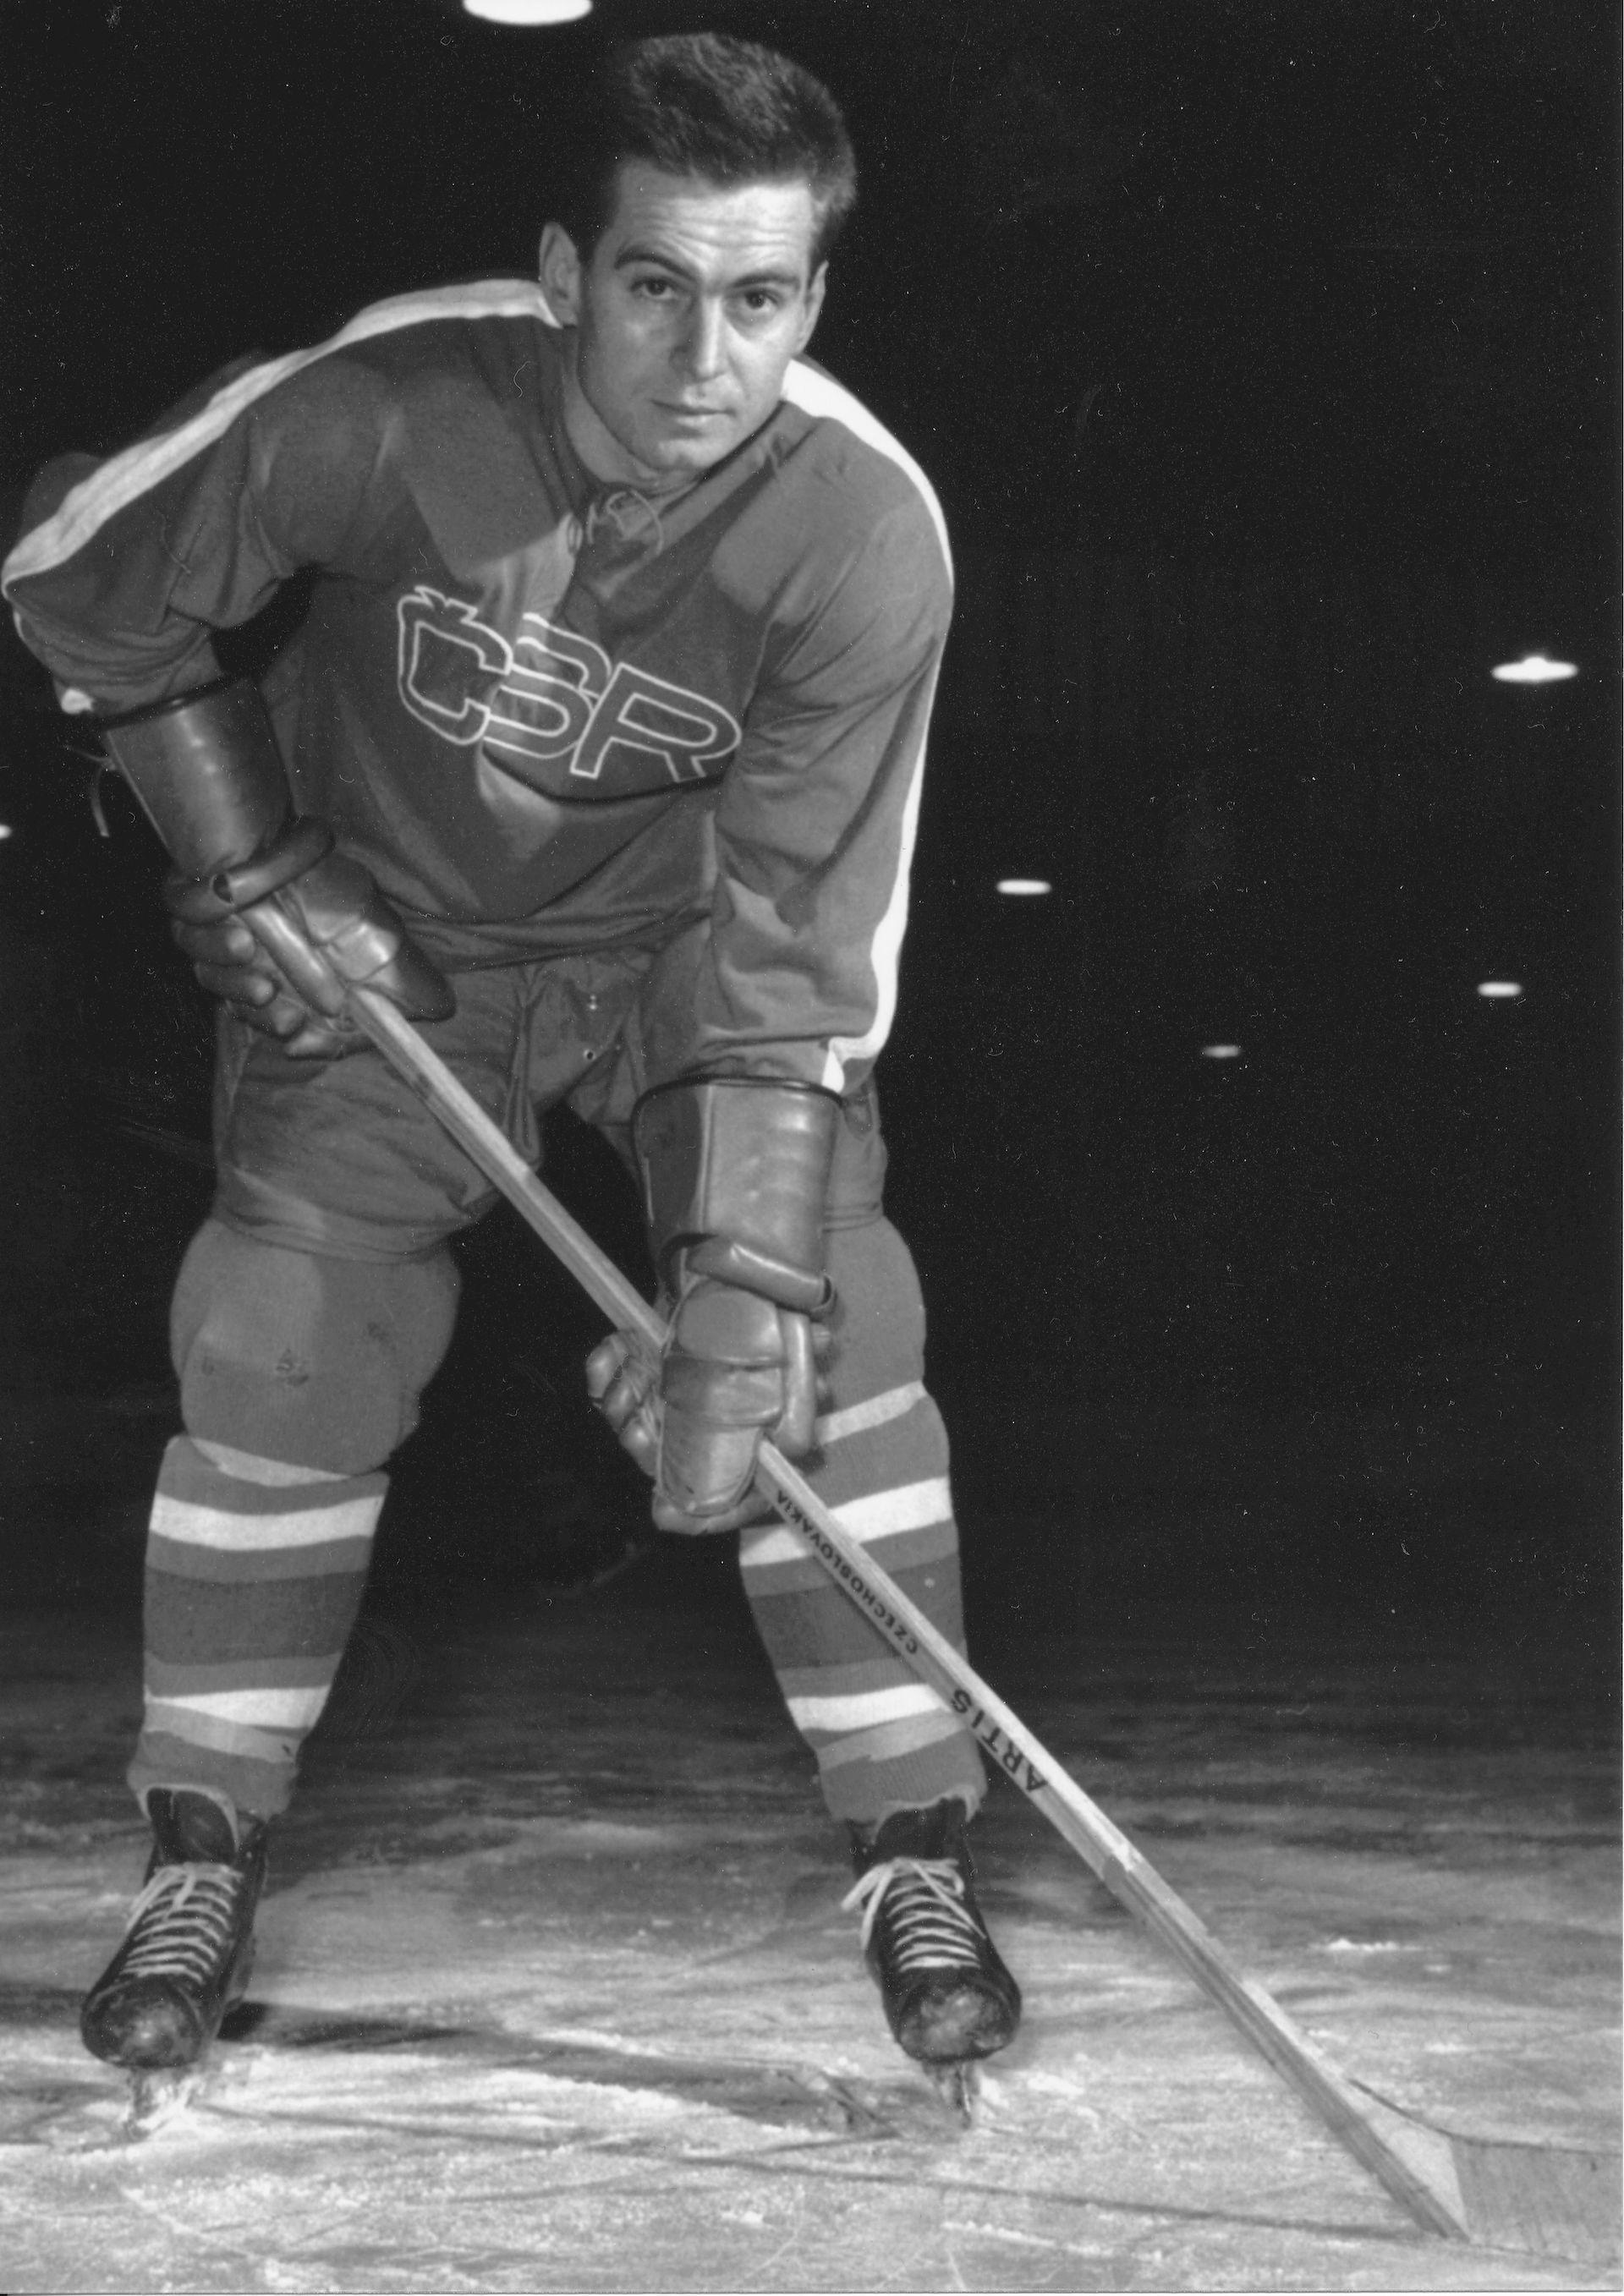 Photo of František Vaněk: Czechoslovakia league ice hockey player, ice hockey player and olympionic